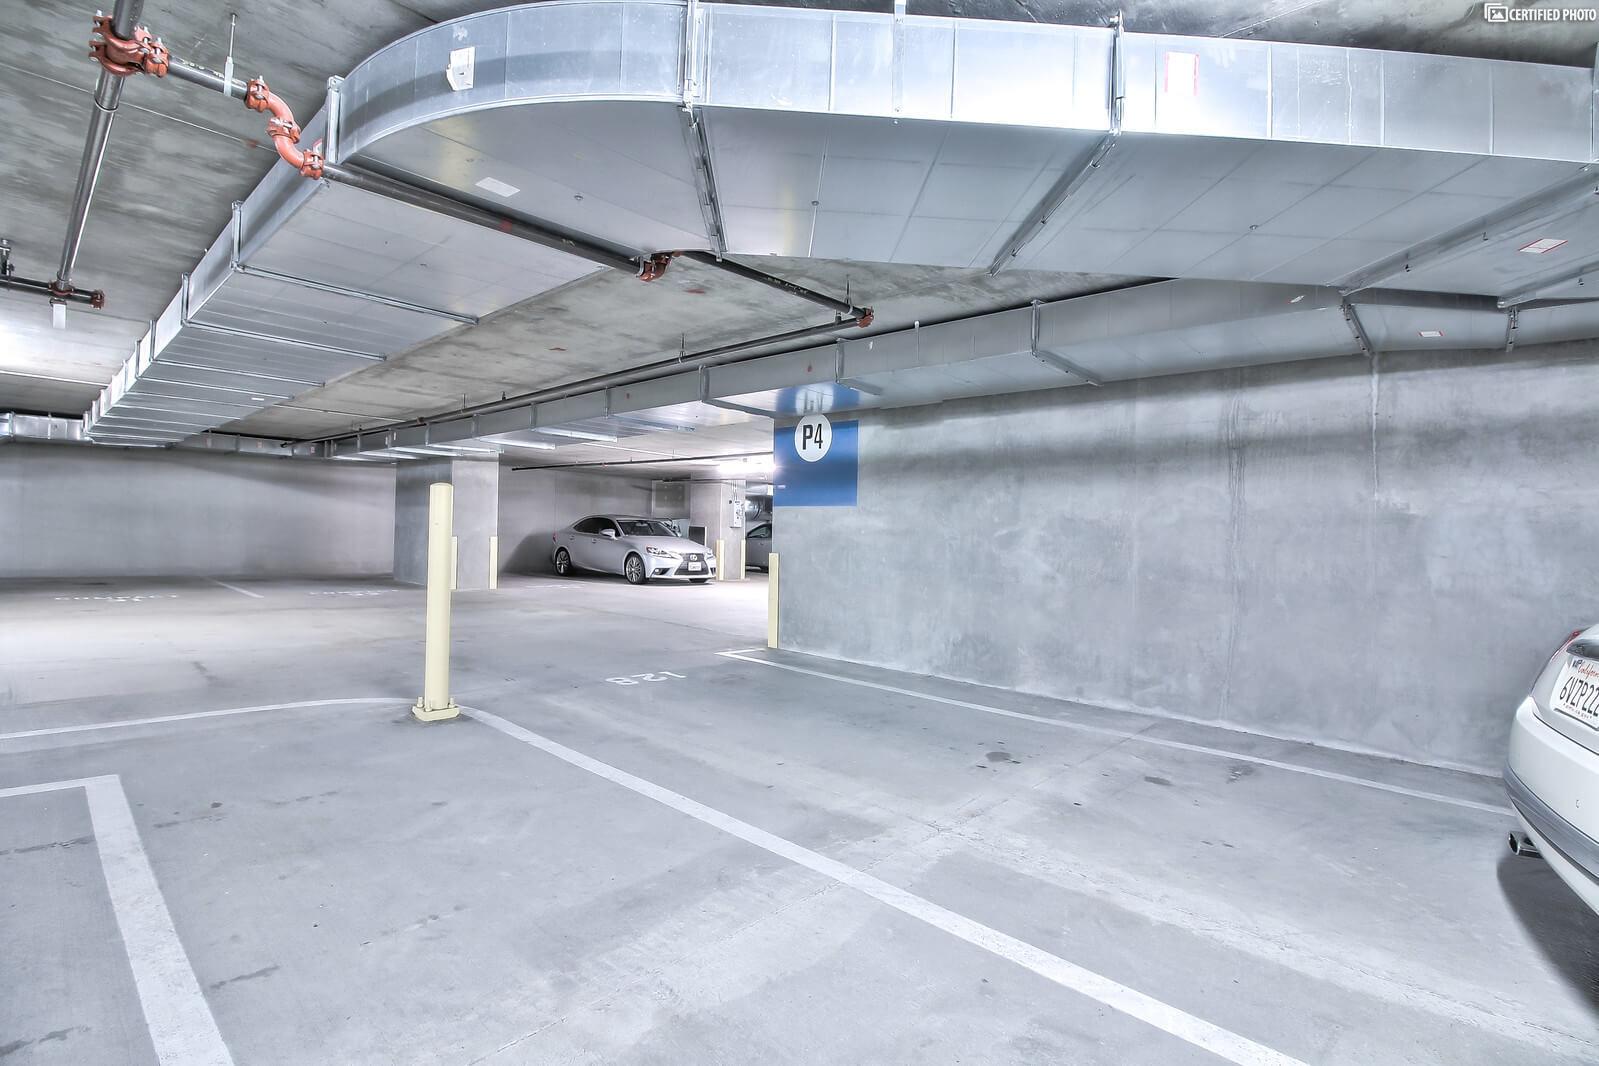 Parking - 2 Spaces